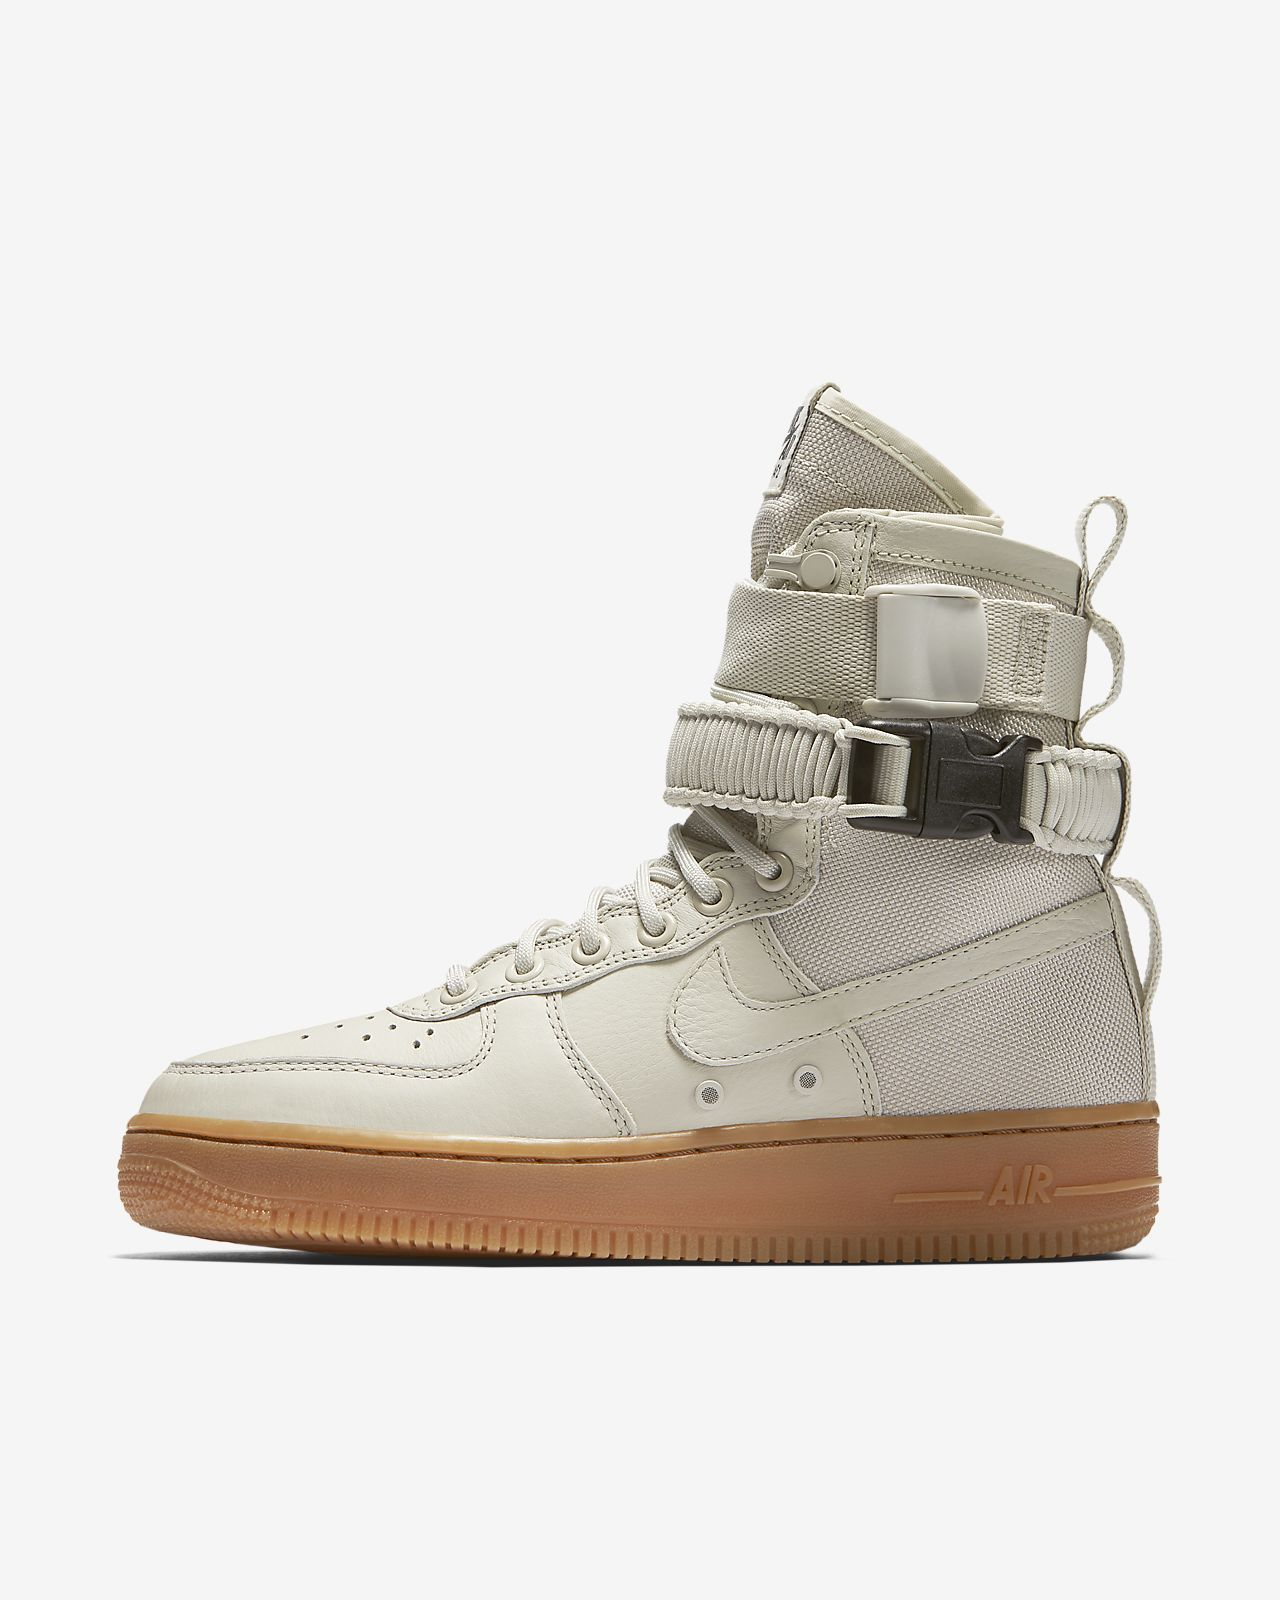 Nike SF Air Force 1 Damenstiefel | My Style